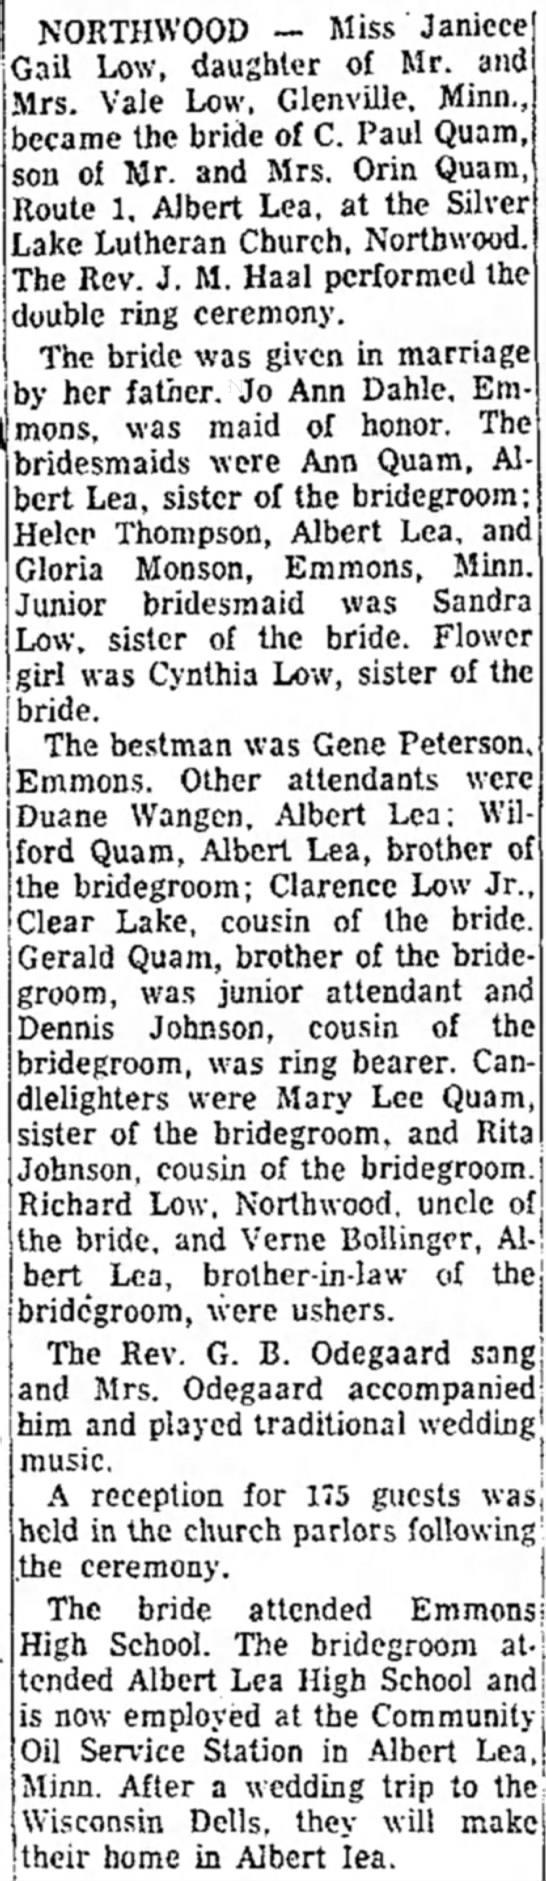 Quam-Low wedding - NORTHWOOD — Miss Janicce Gail Low, daughter of...